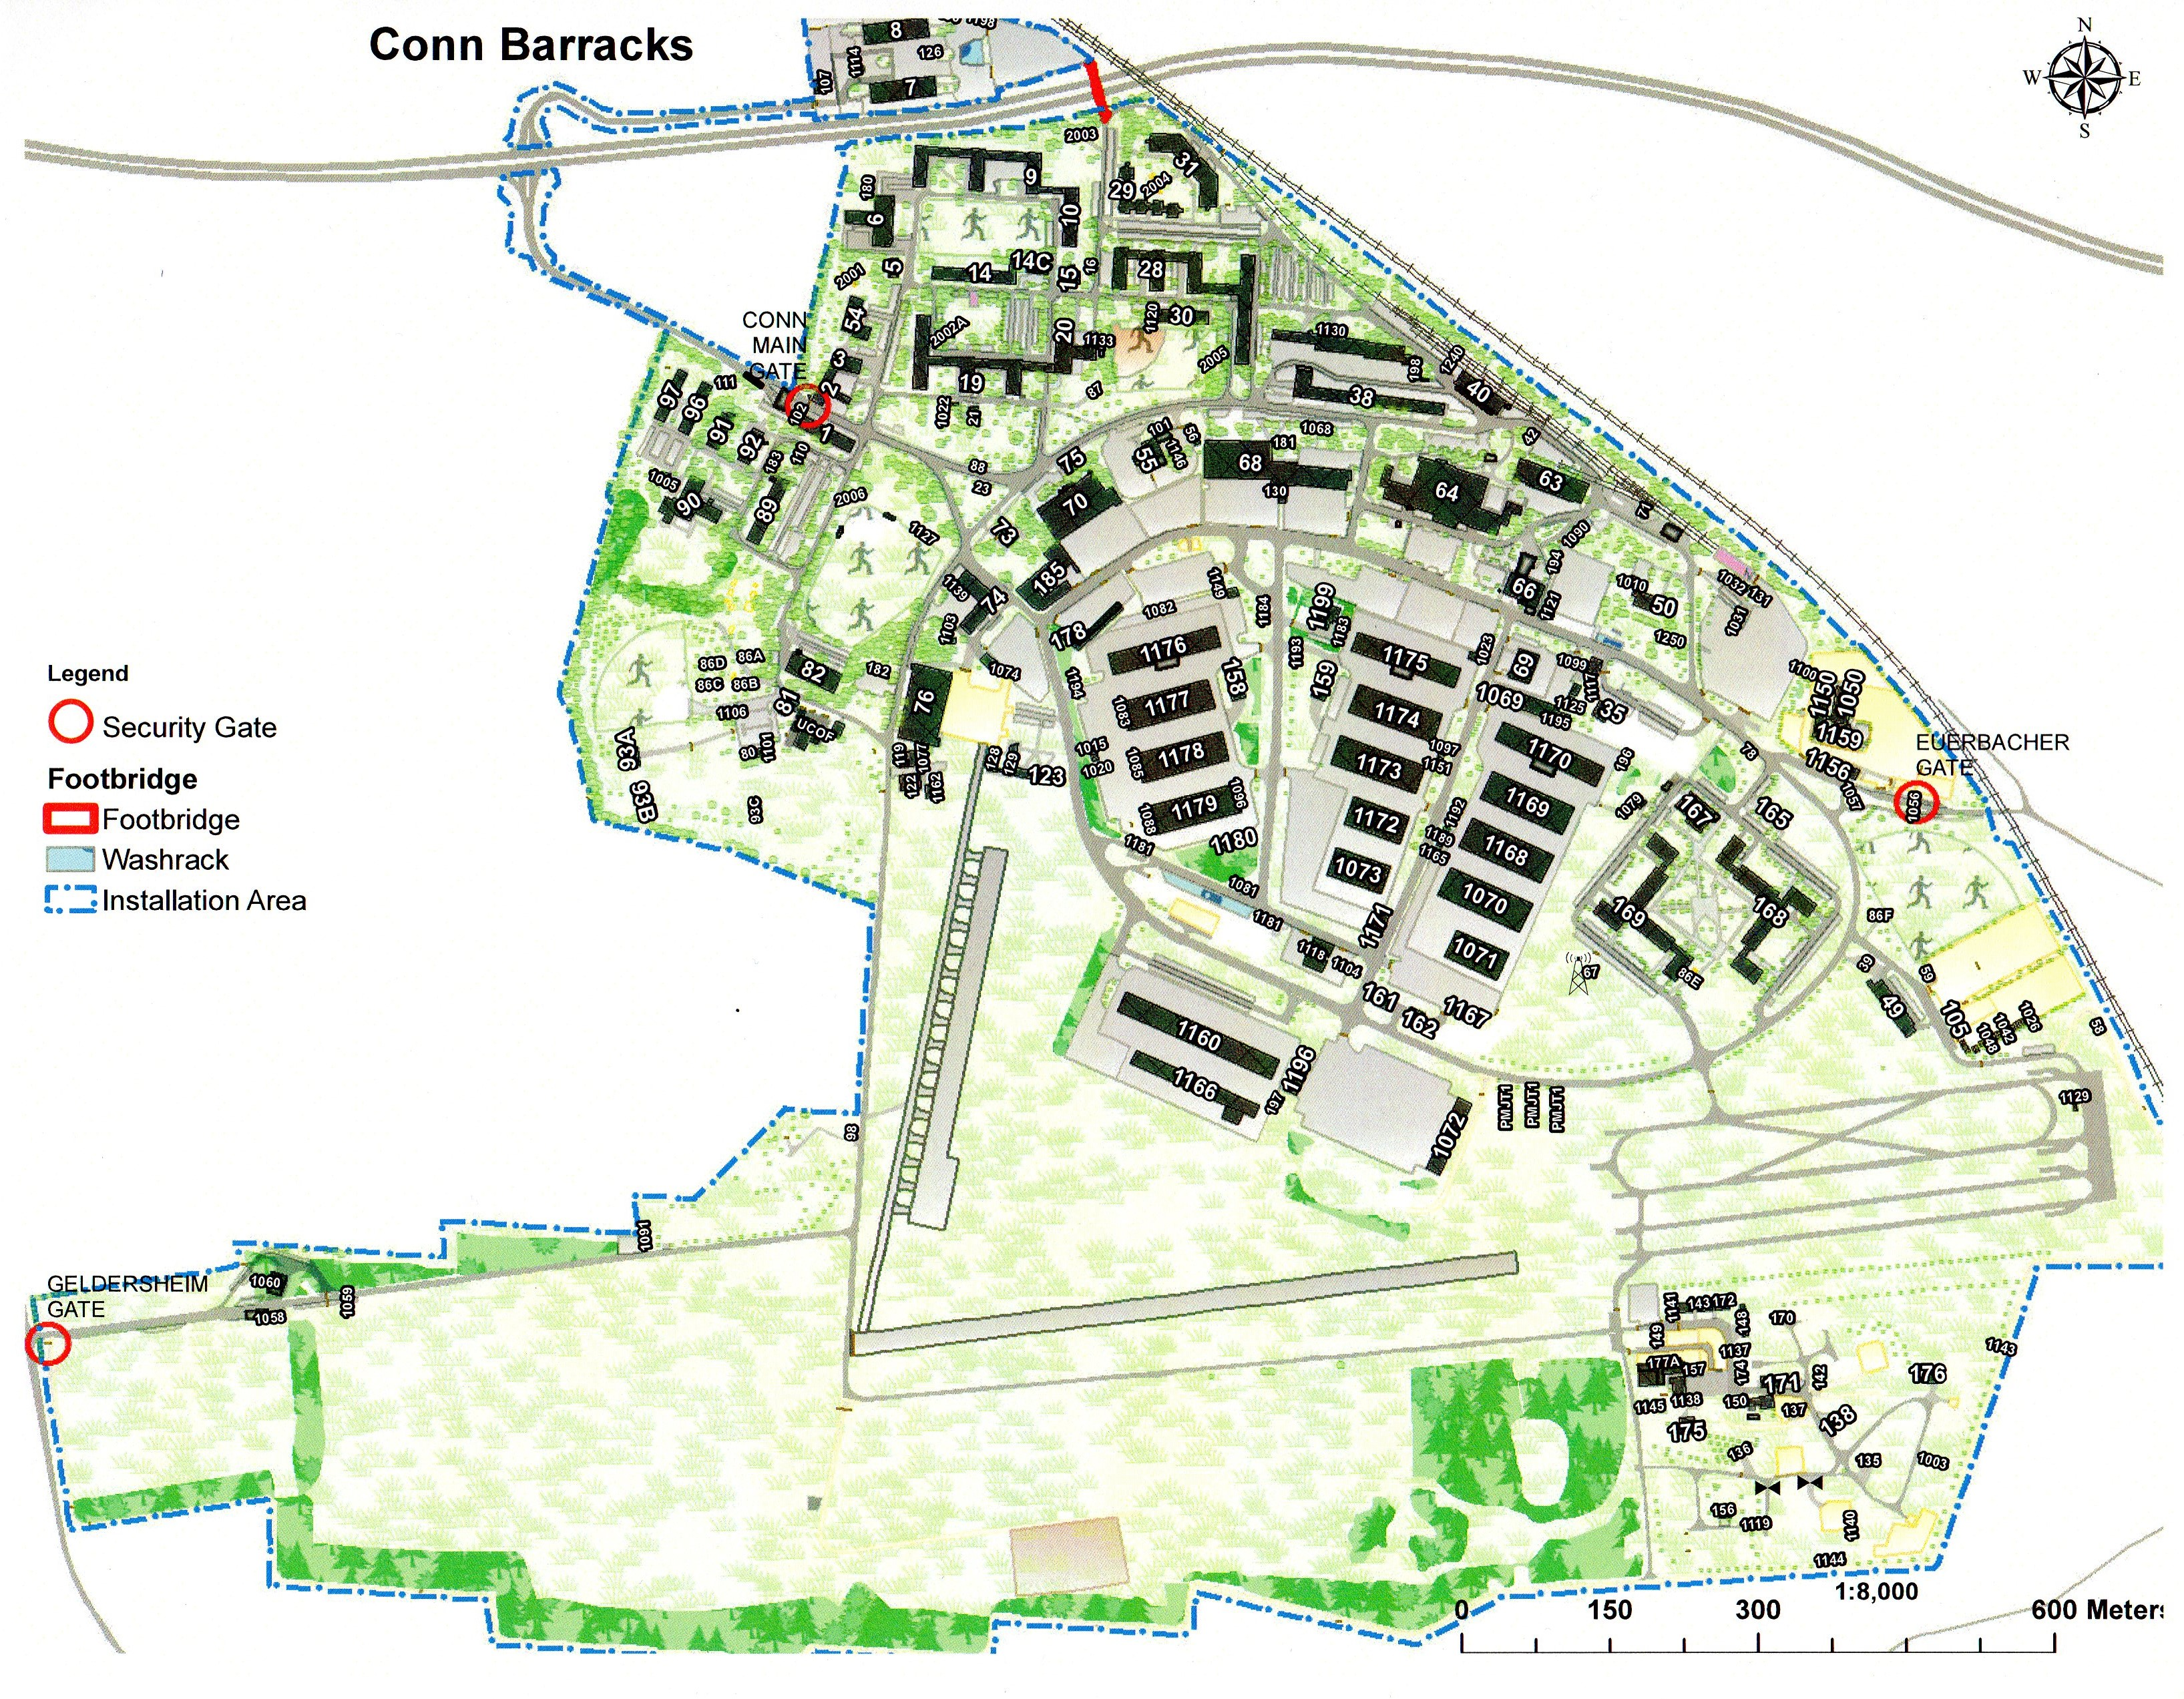 Conn Barracks Mapjpg - Map of conn